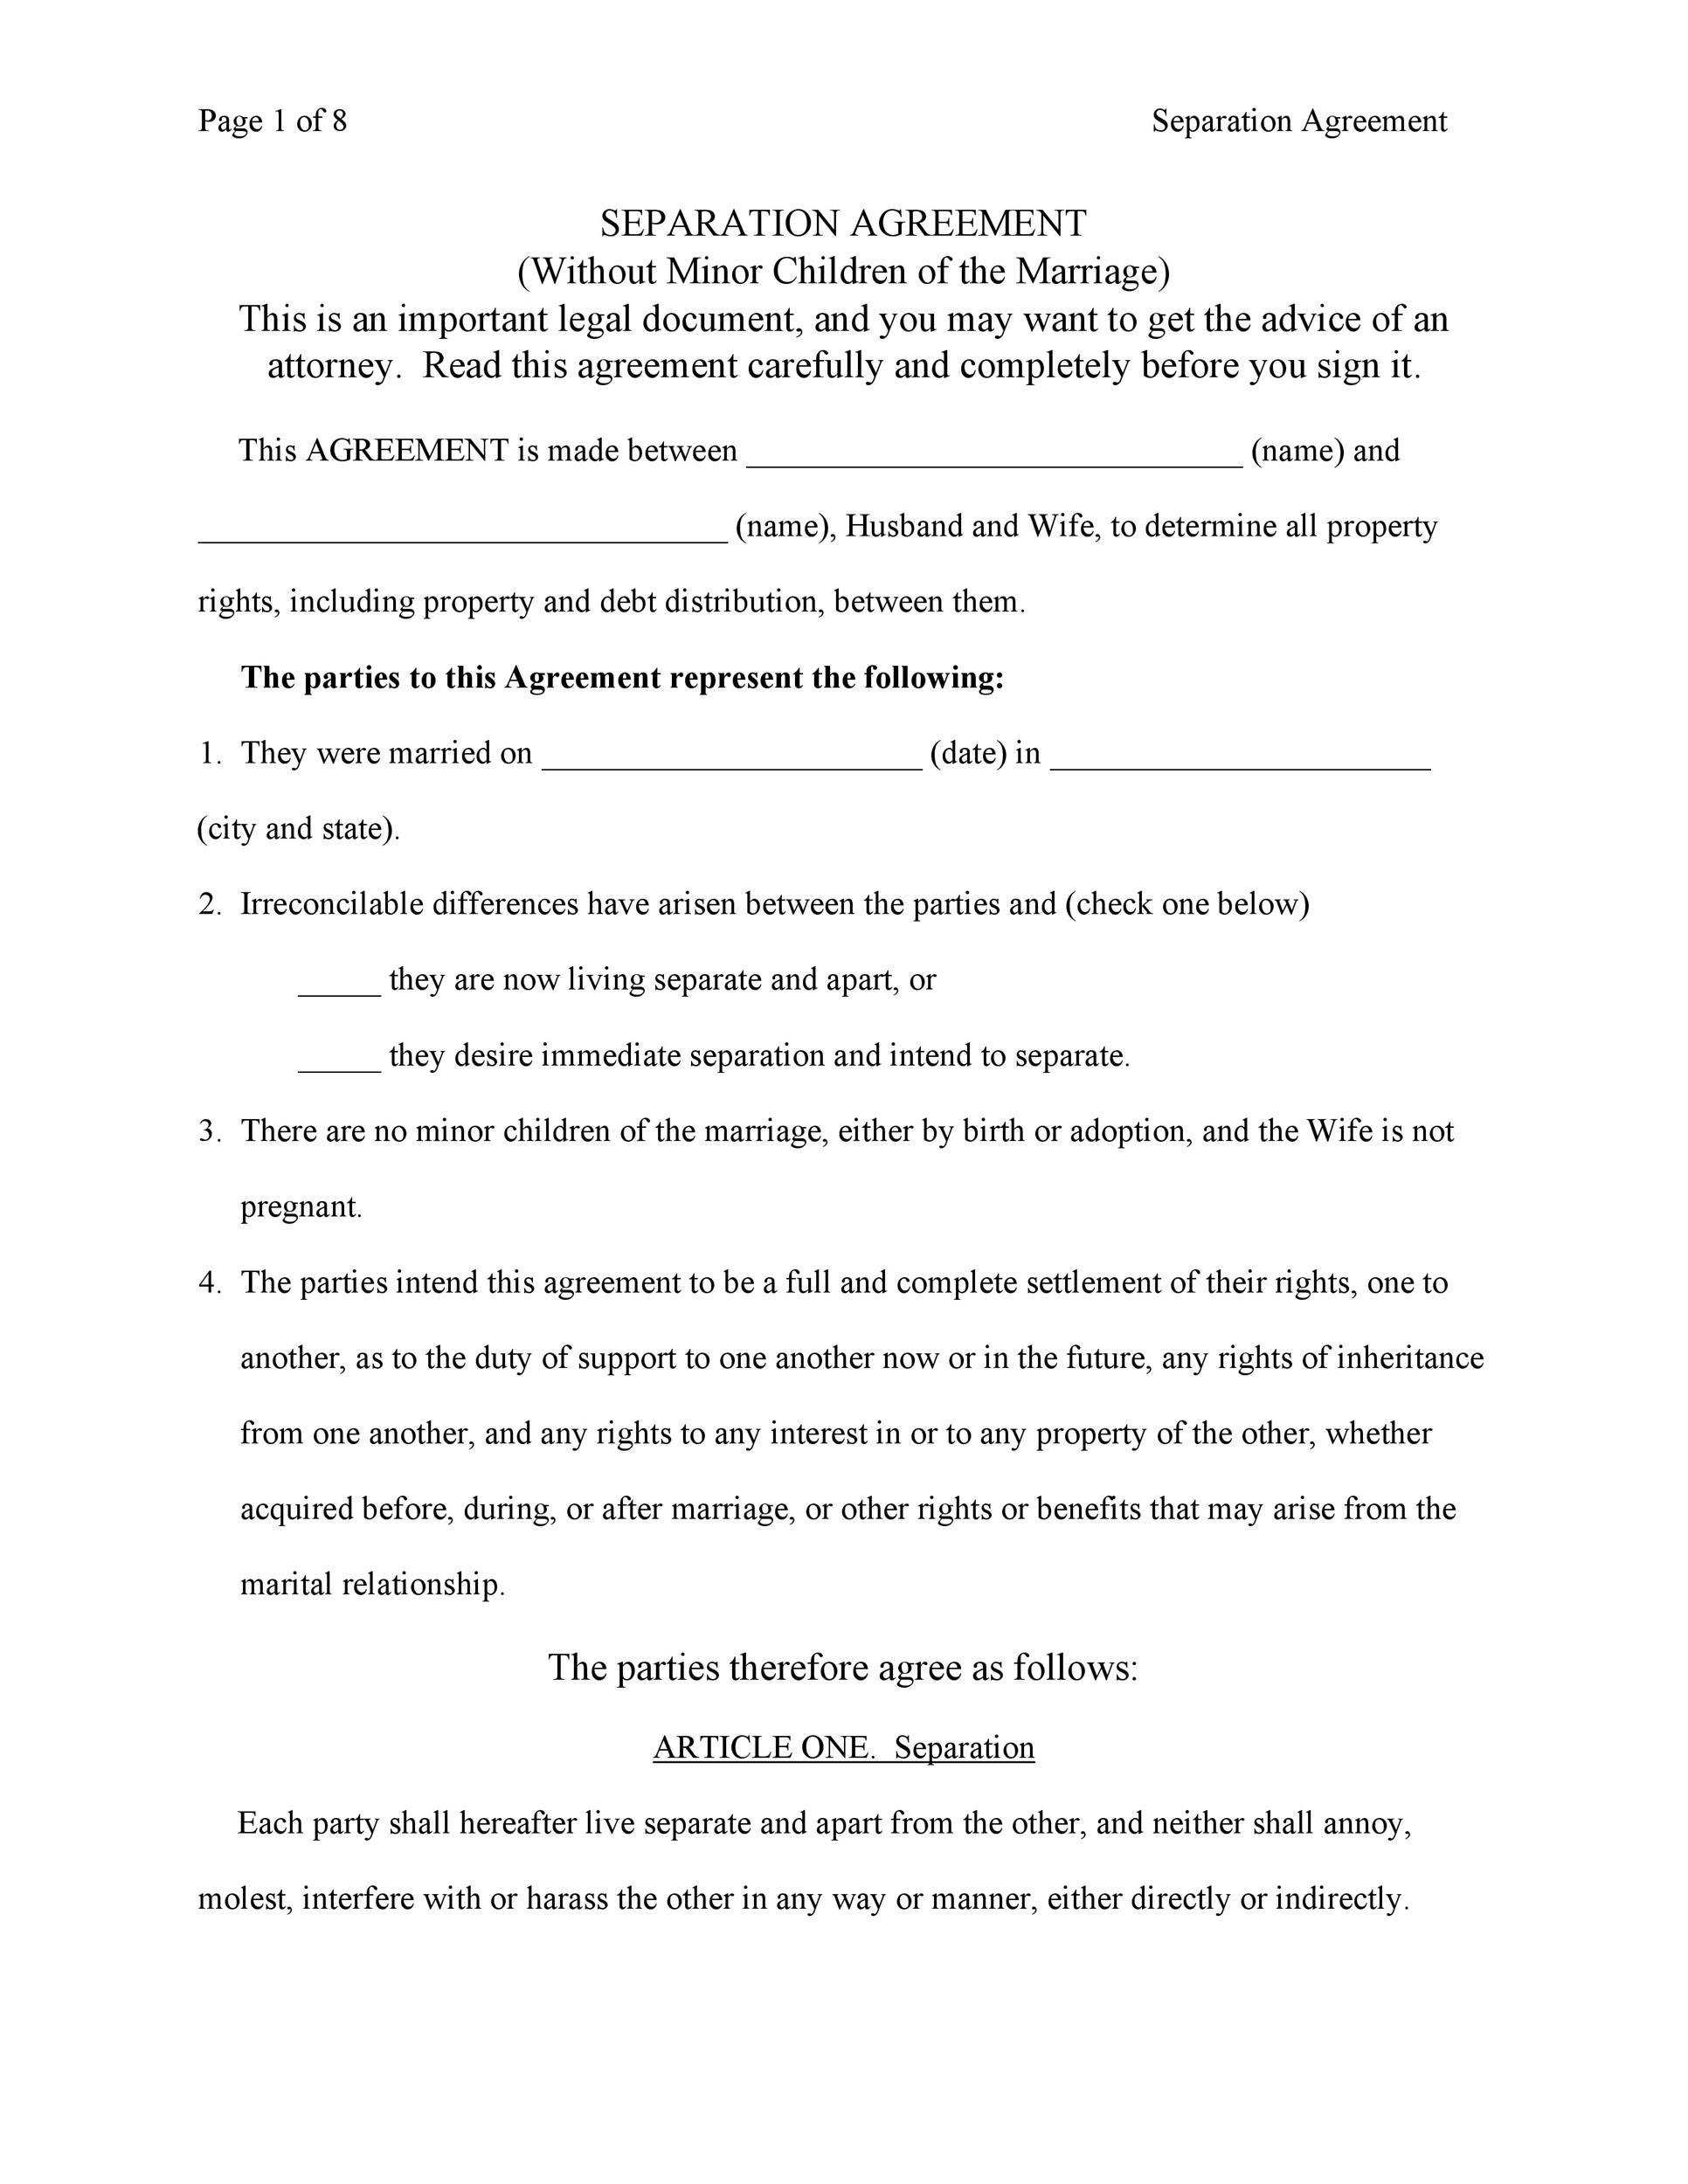 007 Fascinating Virginia Separation Agreement Template Highest Clarity  Marital MarriageFull